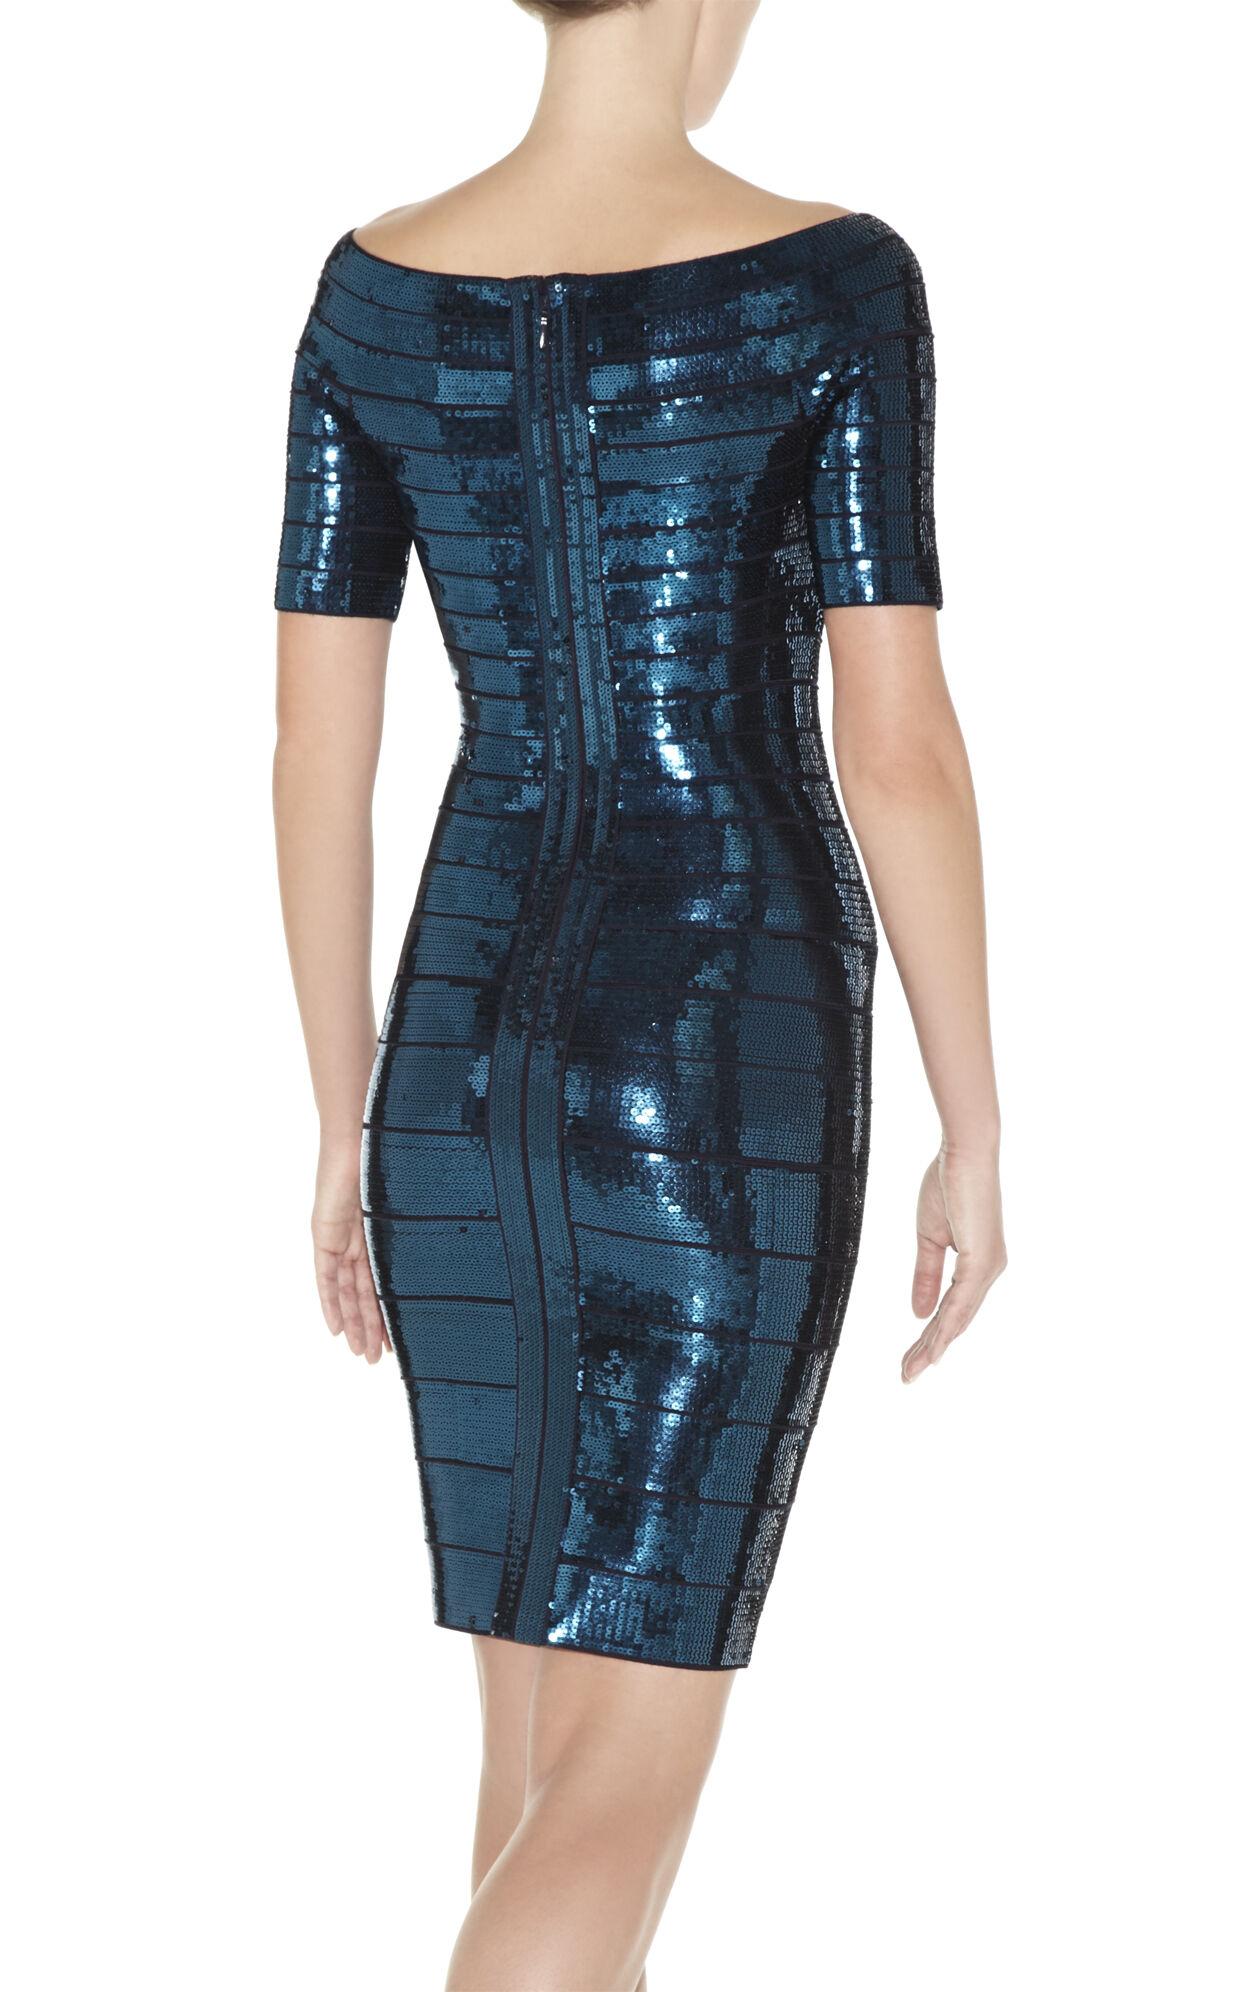 Carmen Sequined Dress